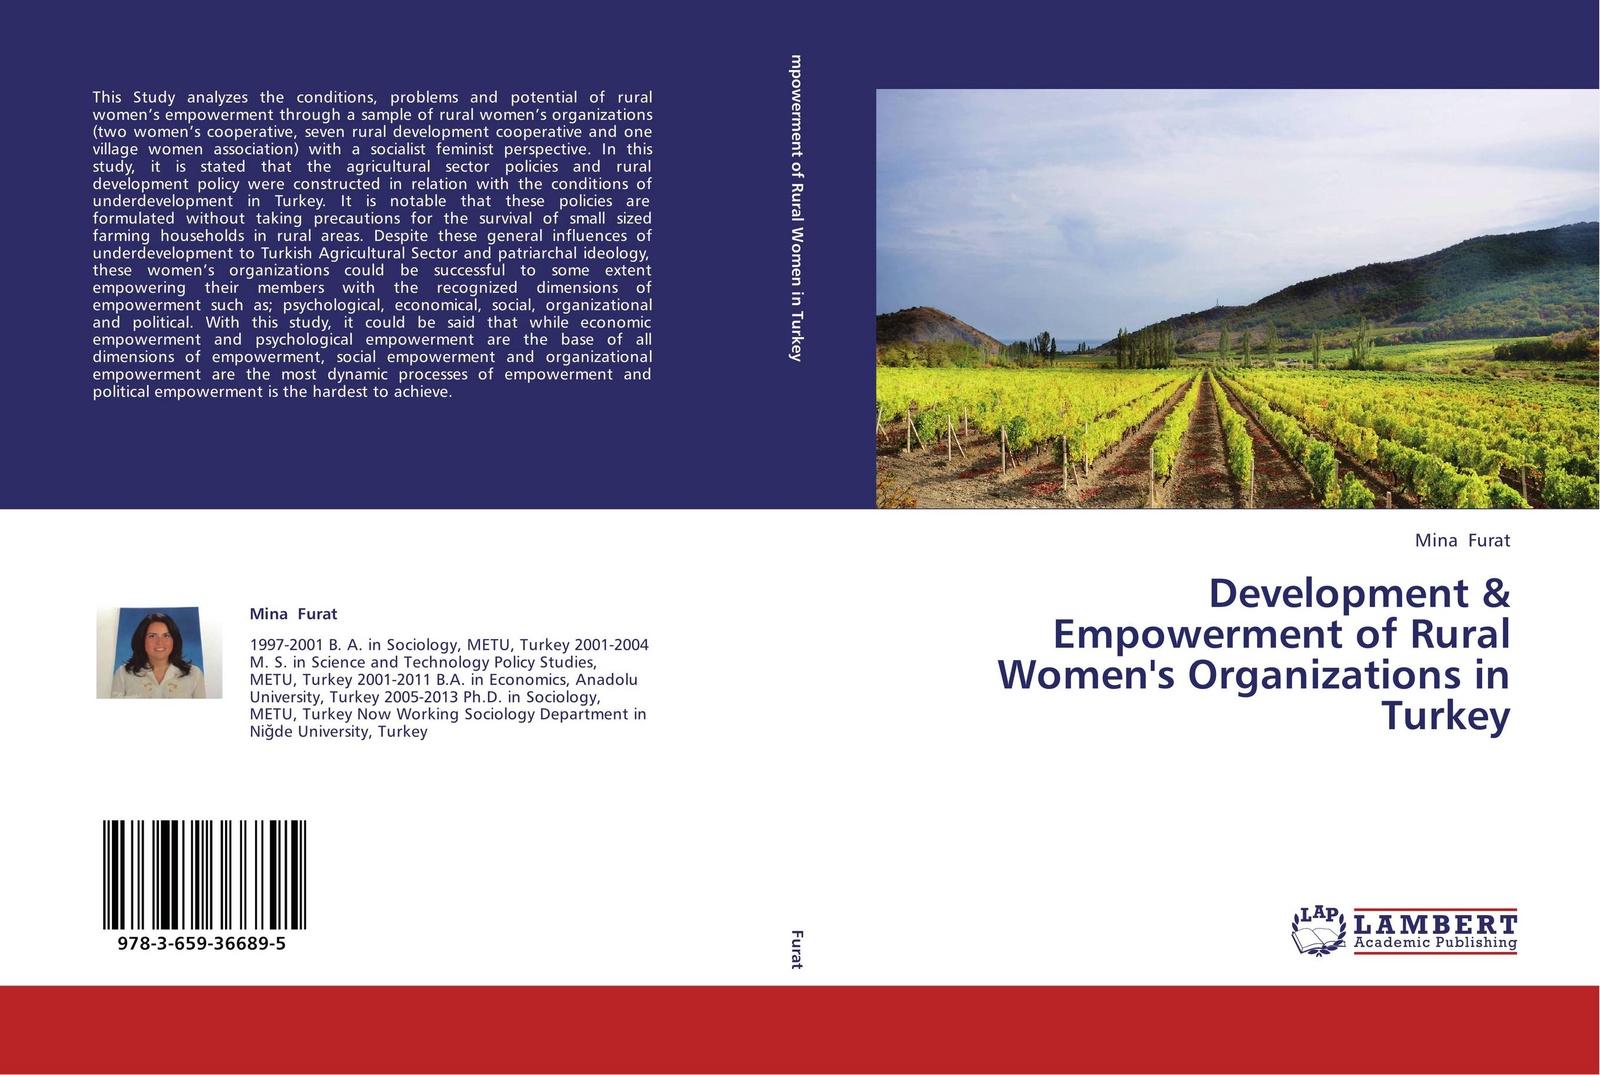 Фото - Mina Furat Development & Empowerment of Rural Women's Organizations in Turkey sabina sultana and shaikh shamim hasan impact of micro credit on empowerment of rural women in bangladesh